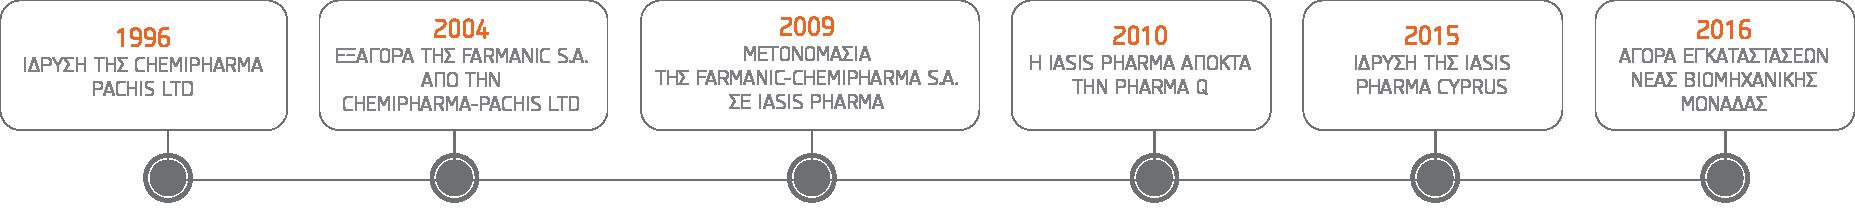 iasis pharma history